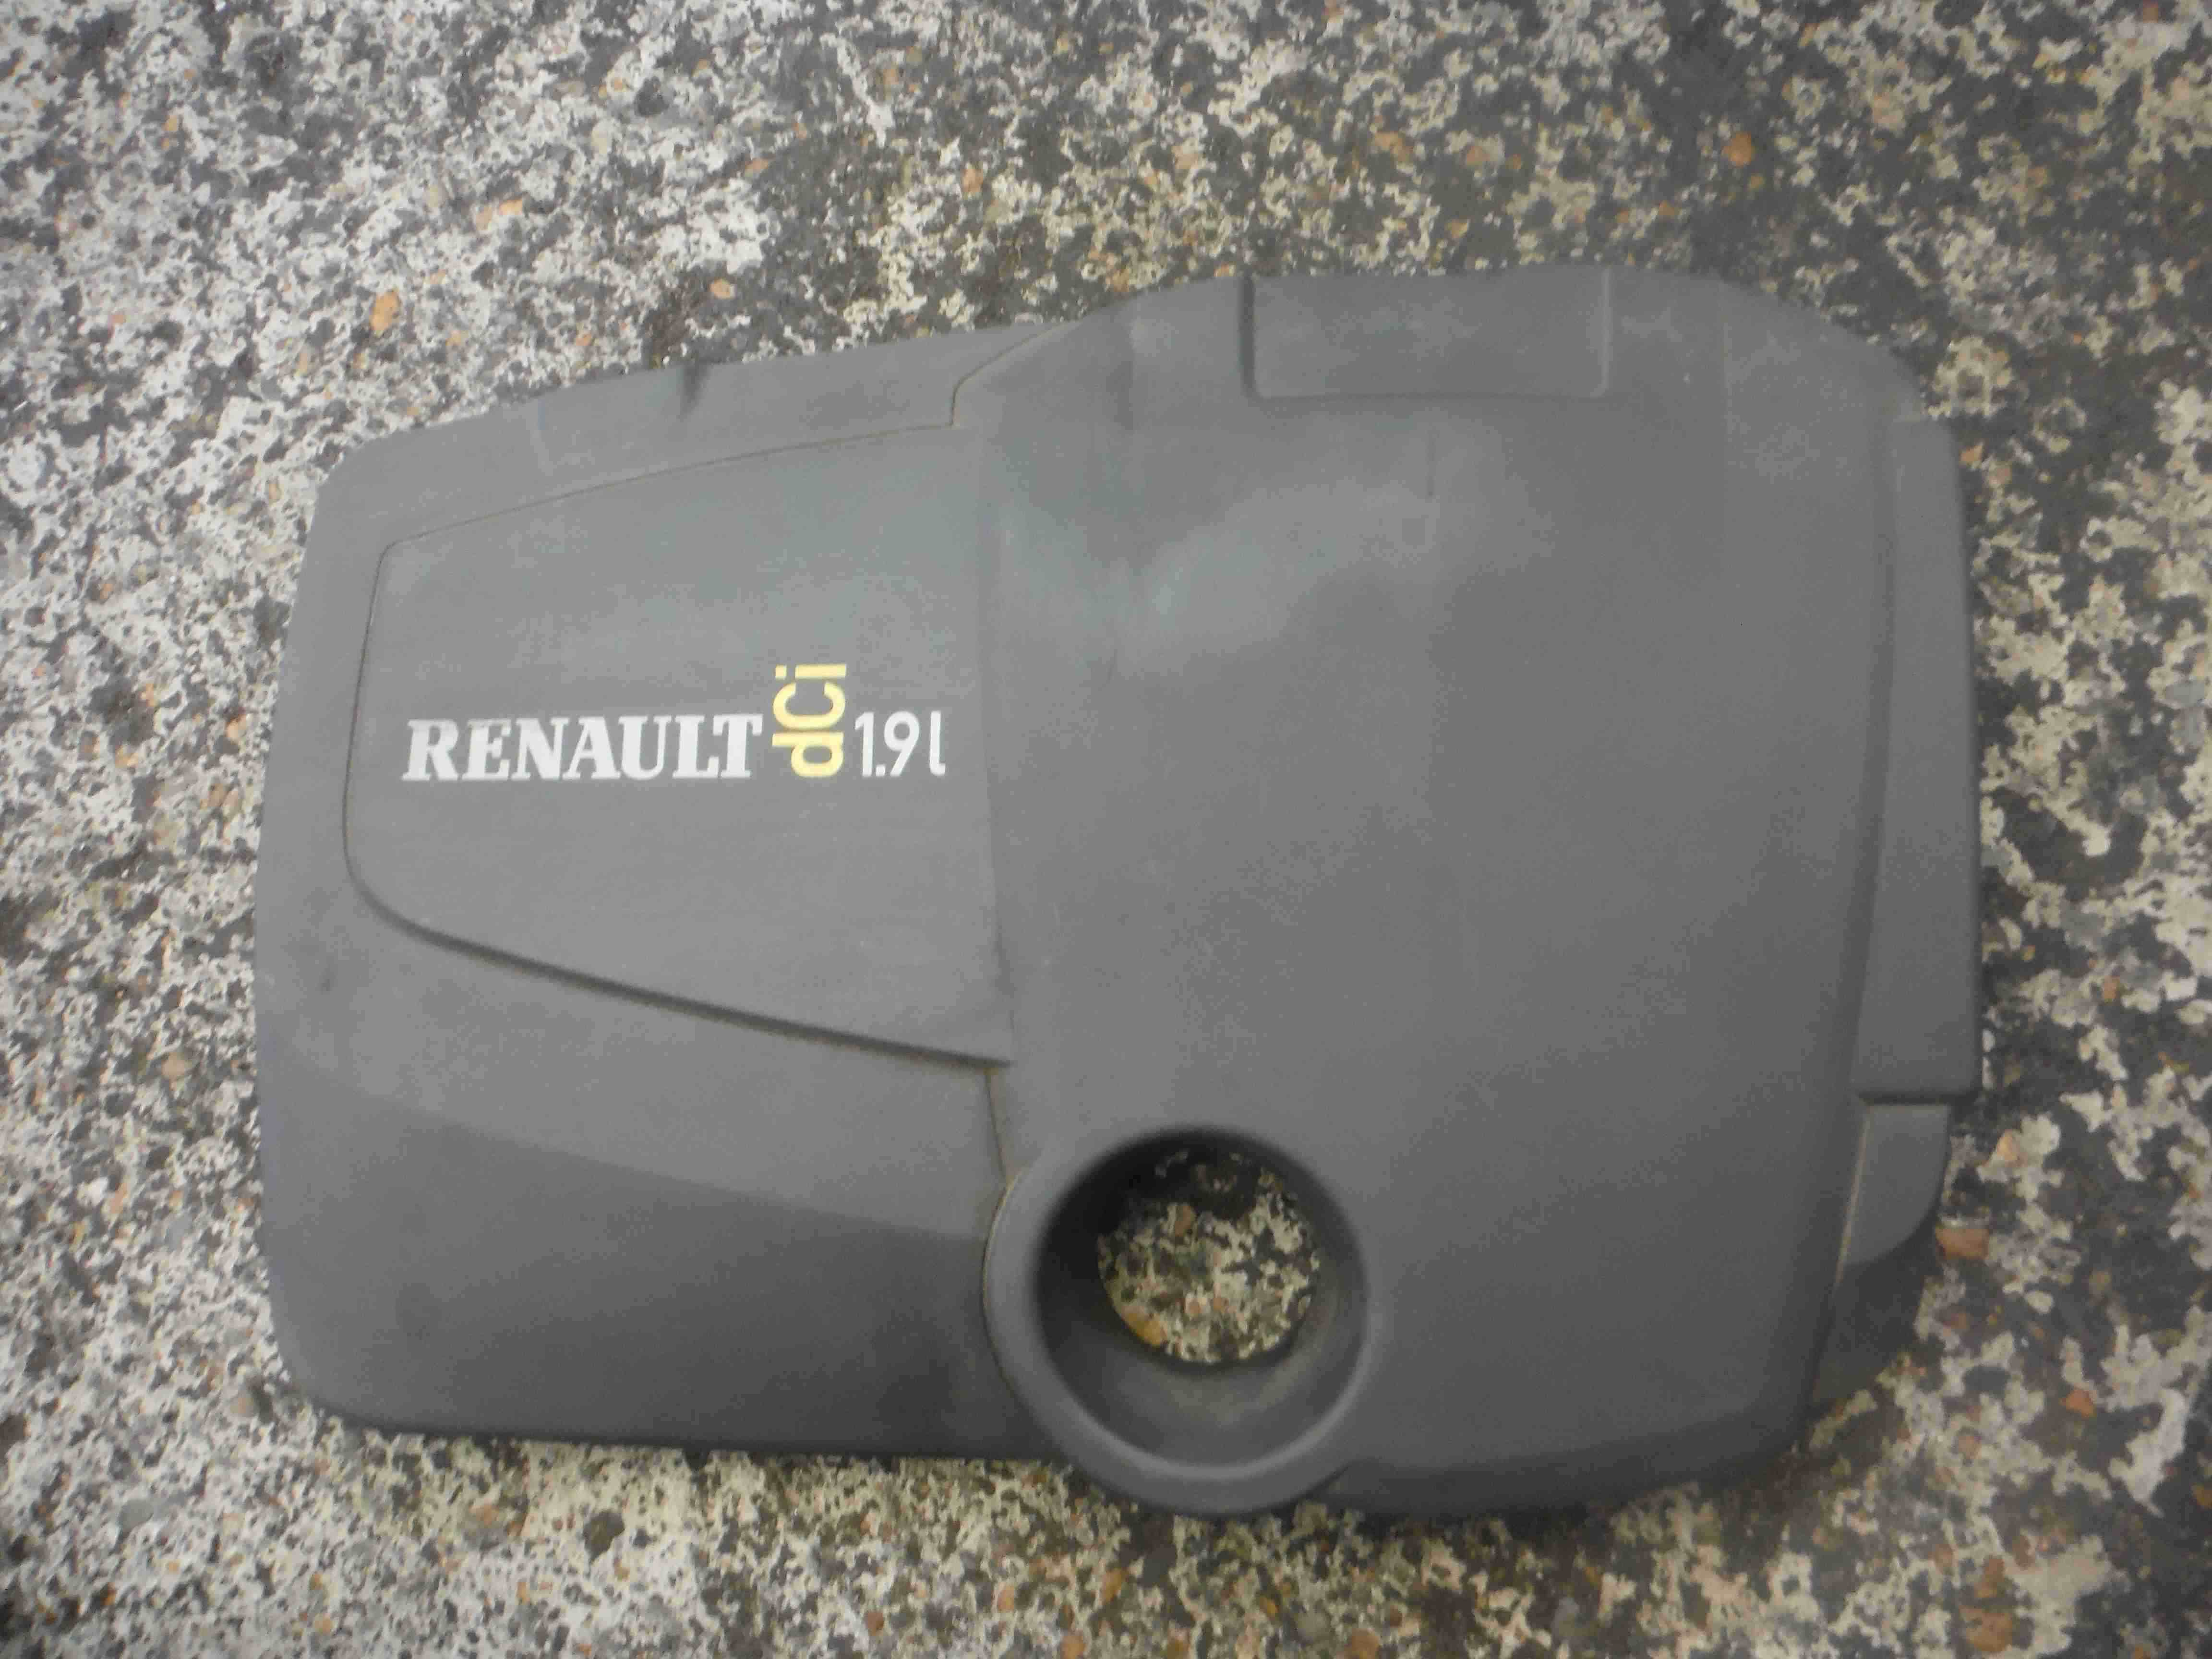 Renault Megane 2002-2008 19dCi Plastic Engine Cover 8200391485